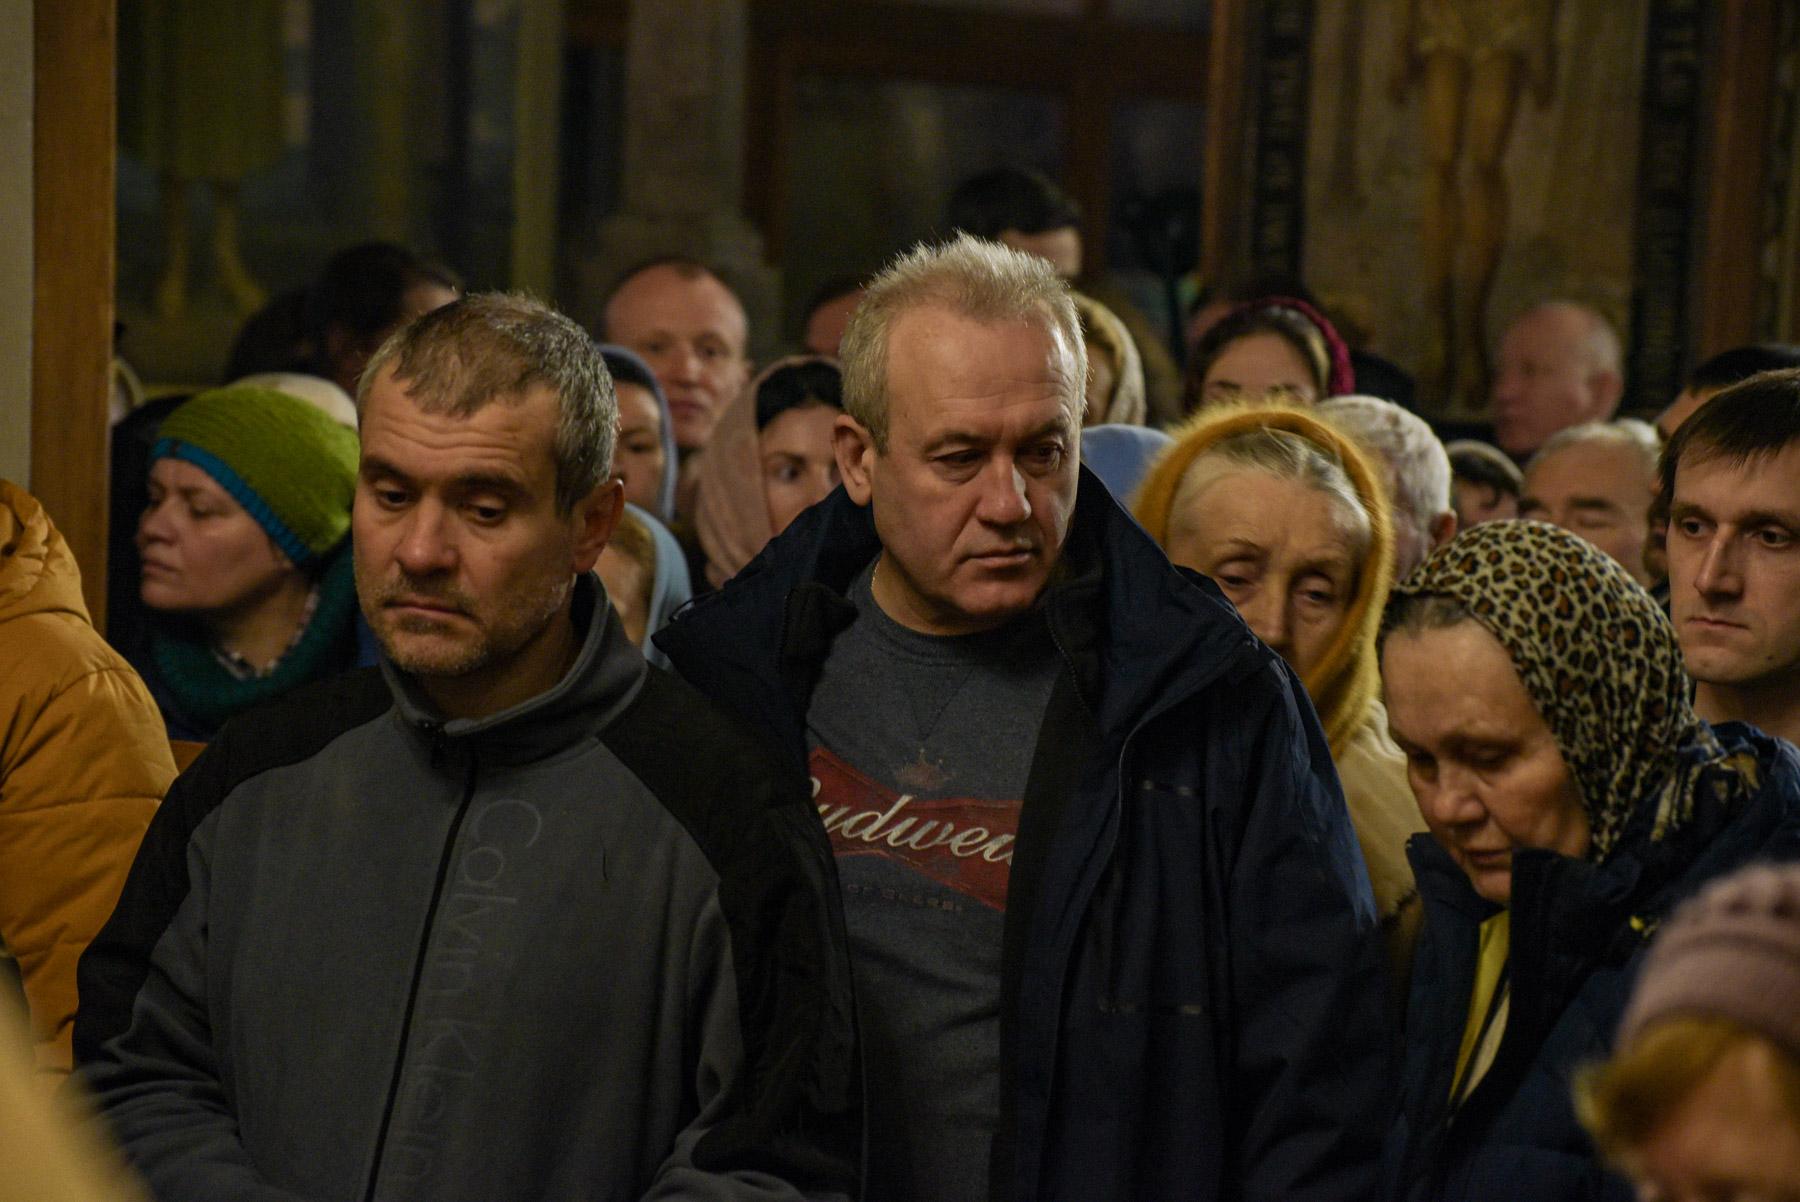 photos of orthodox christmas 0139 2